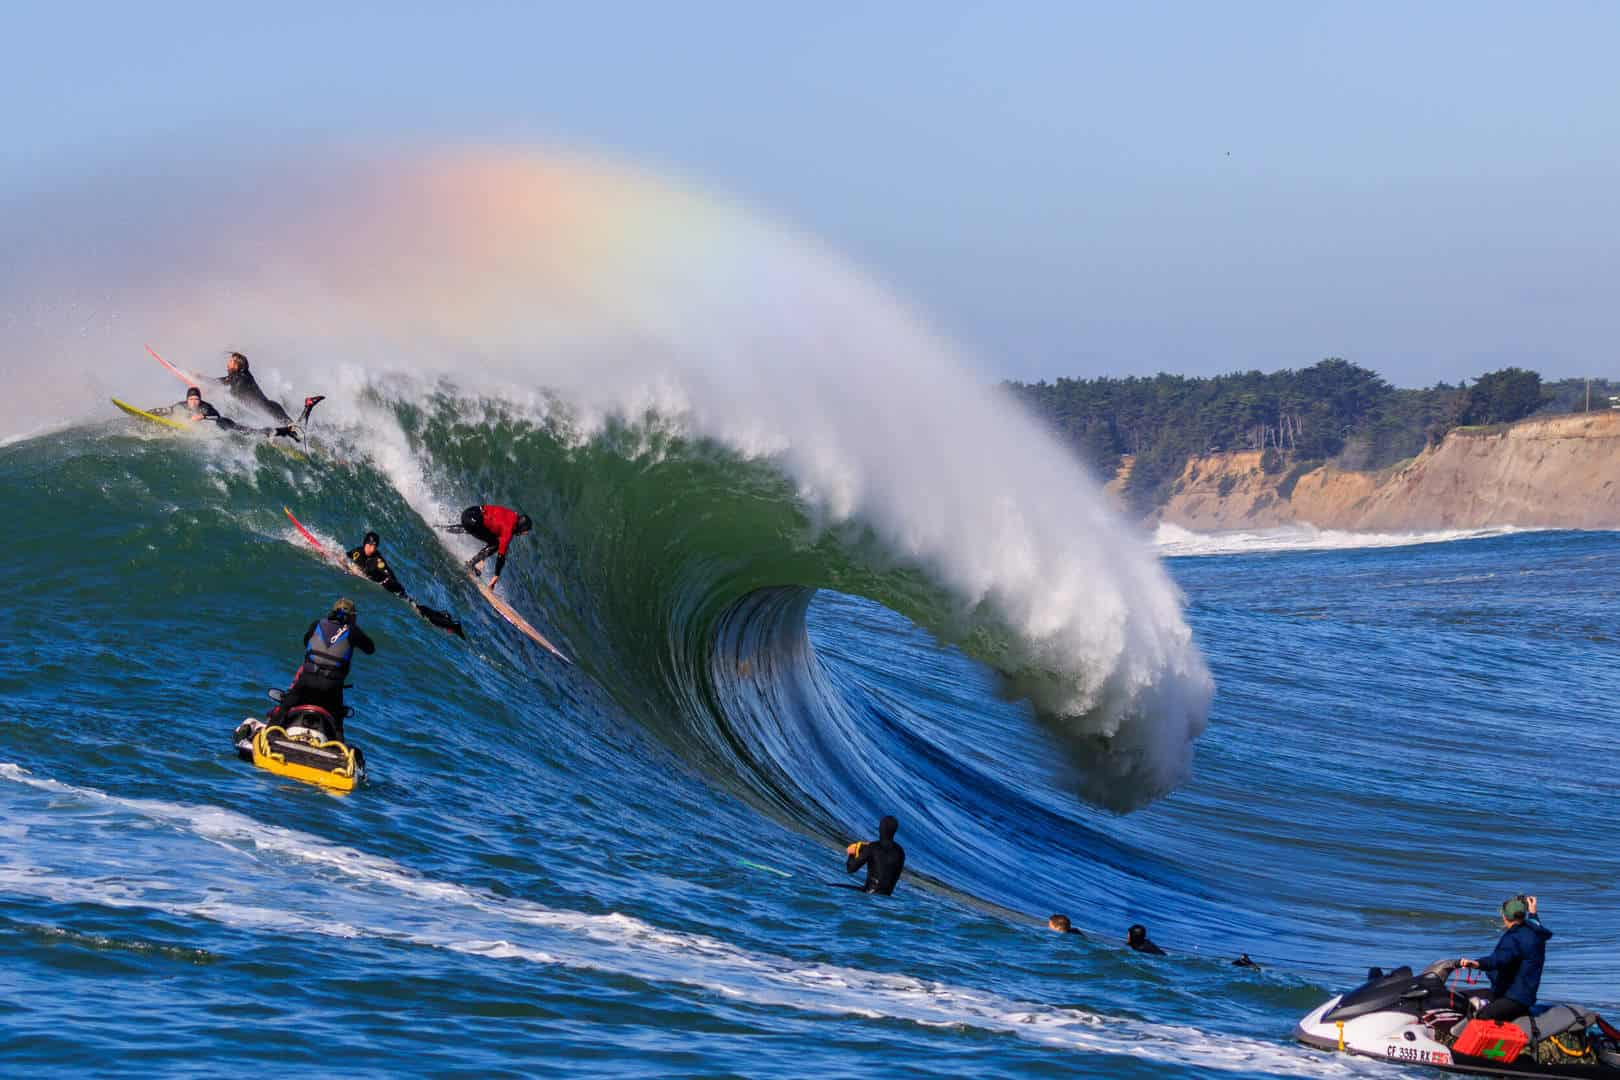 mejores olas